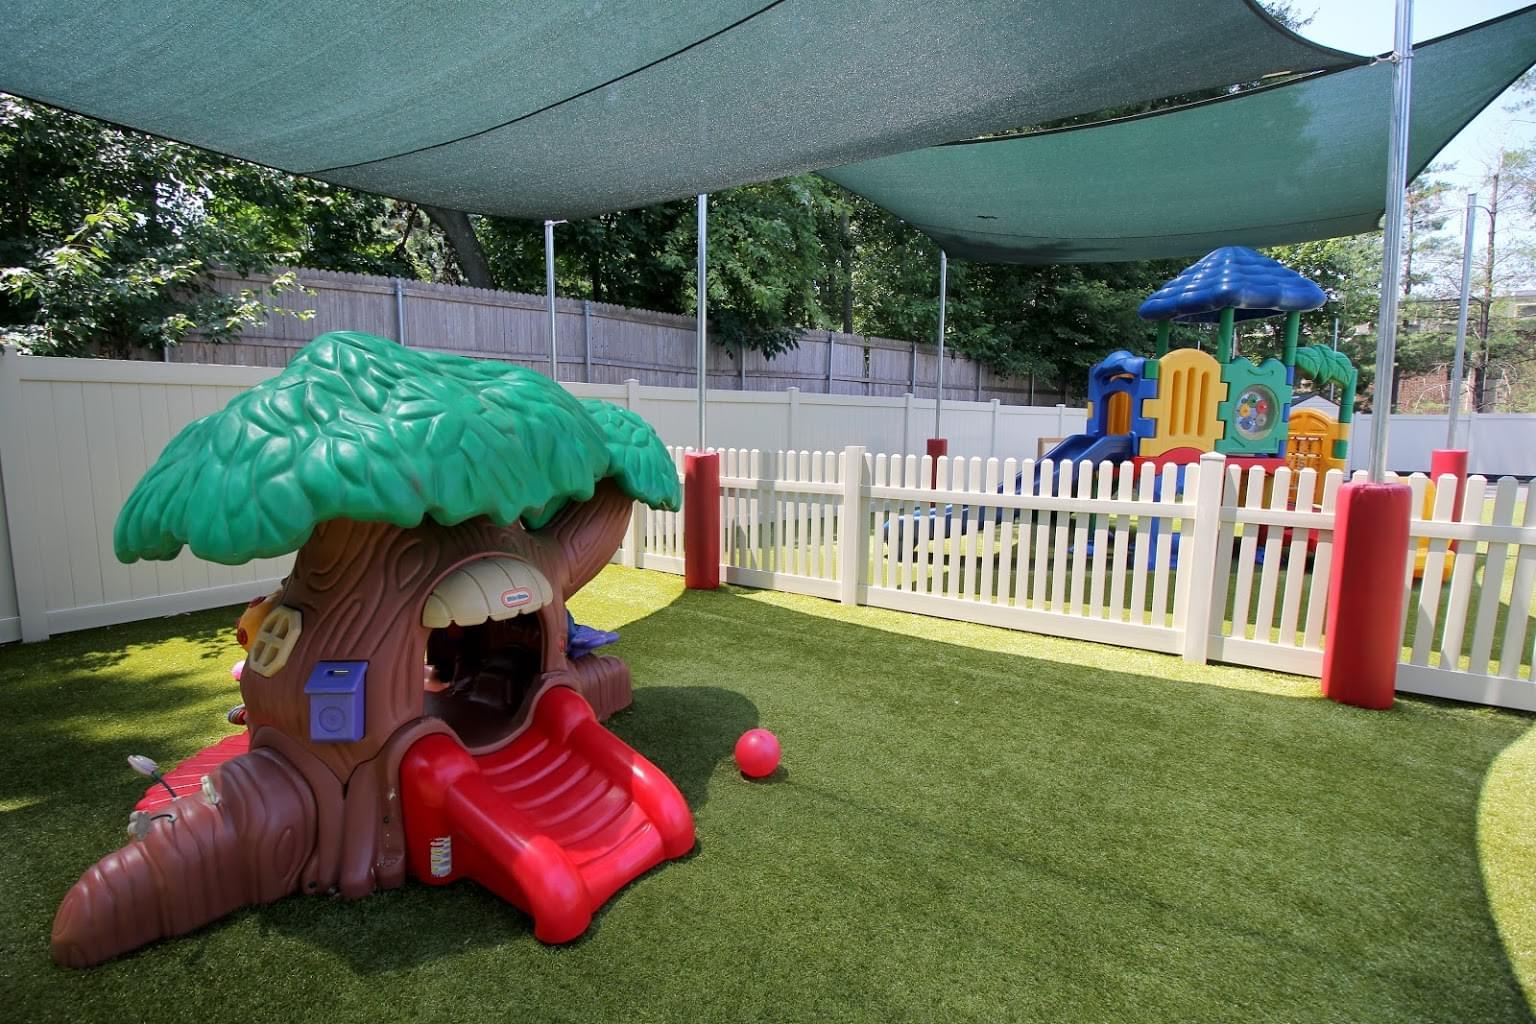 Lightbridge Academy Day Care Center in West Caldwell, NJ playground